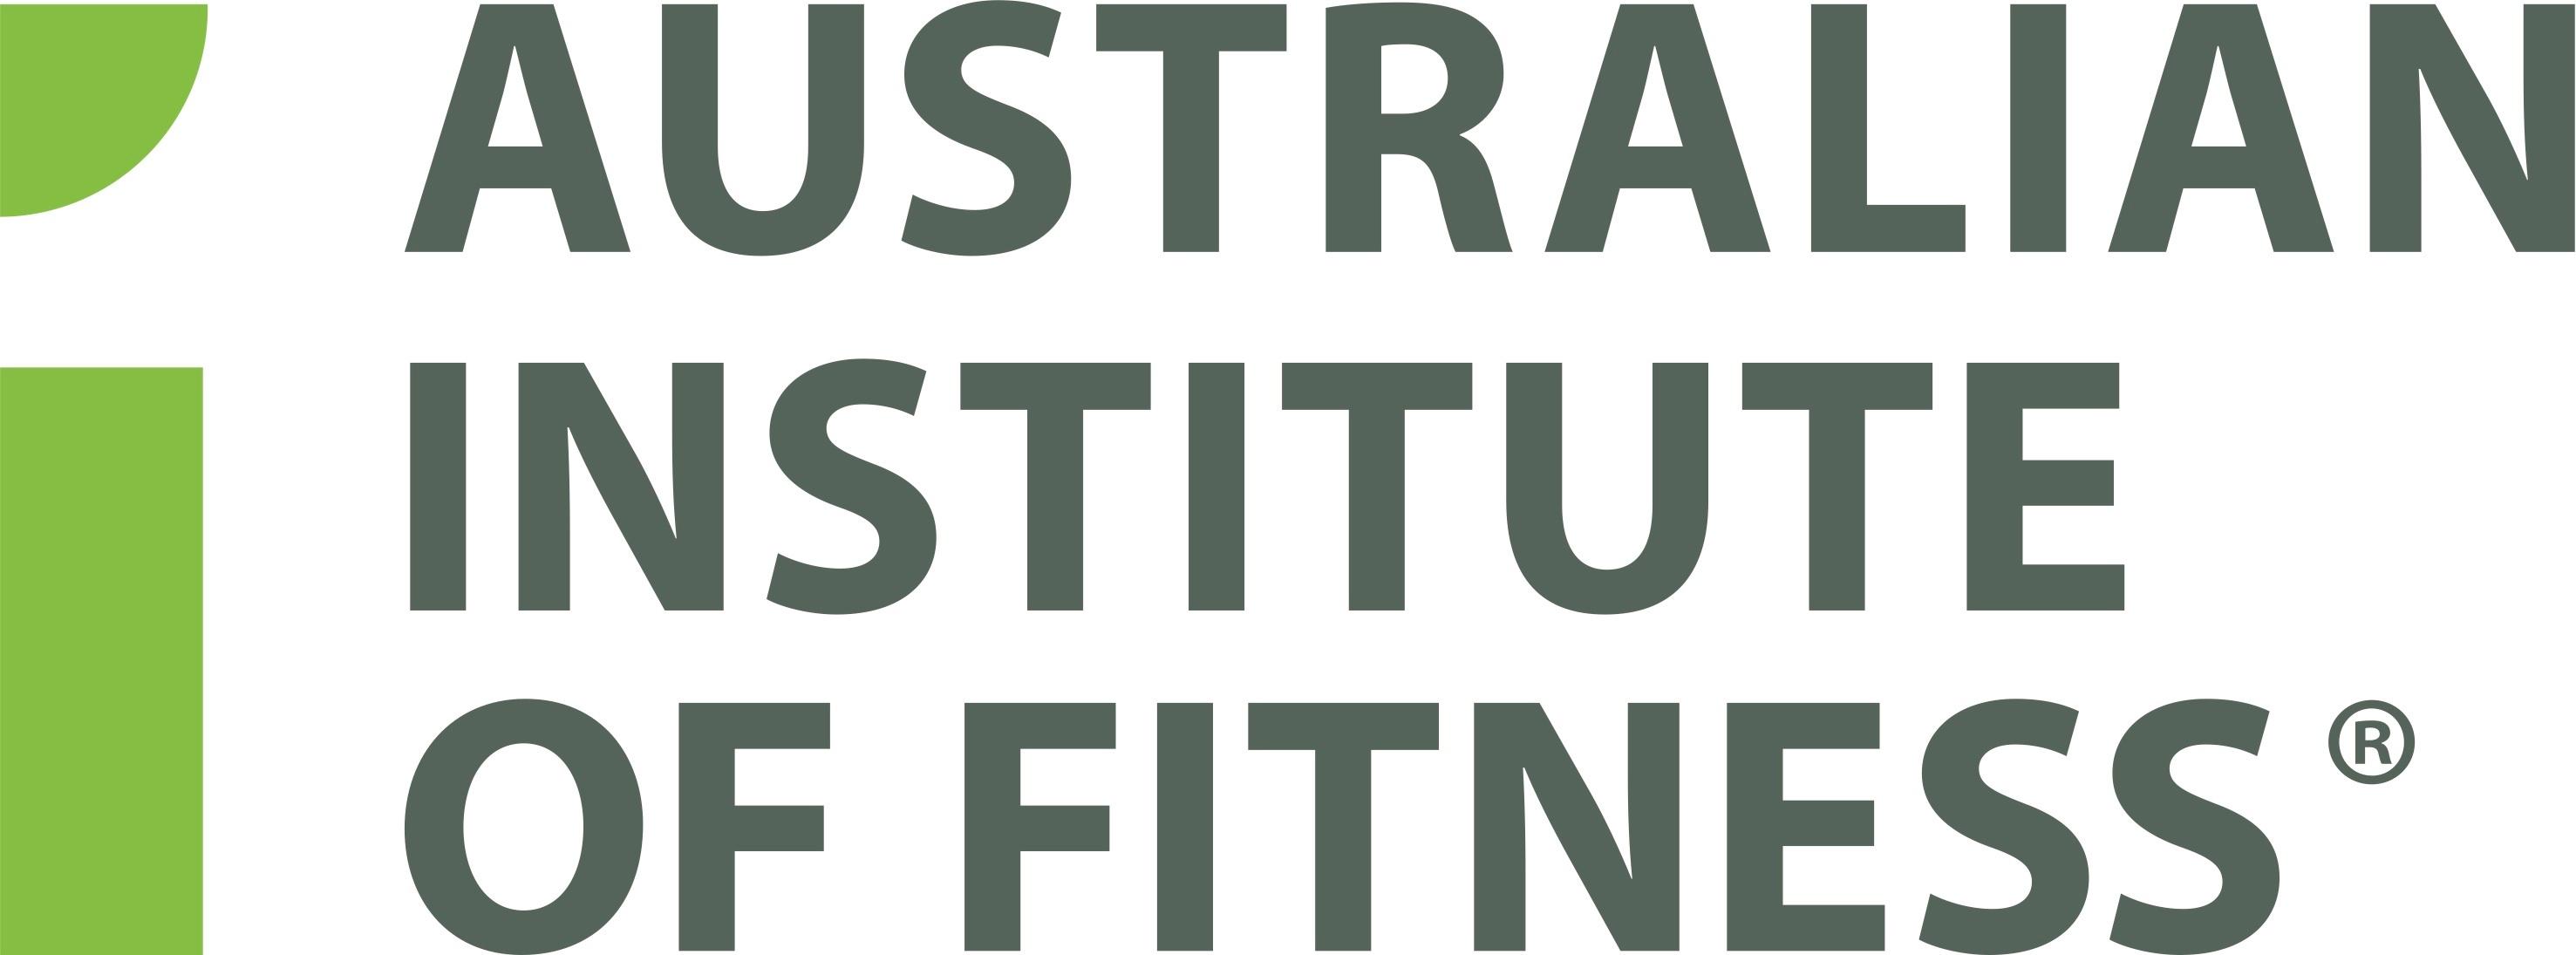 Australian Institute of Fitness